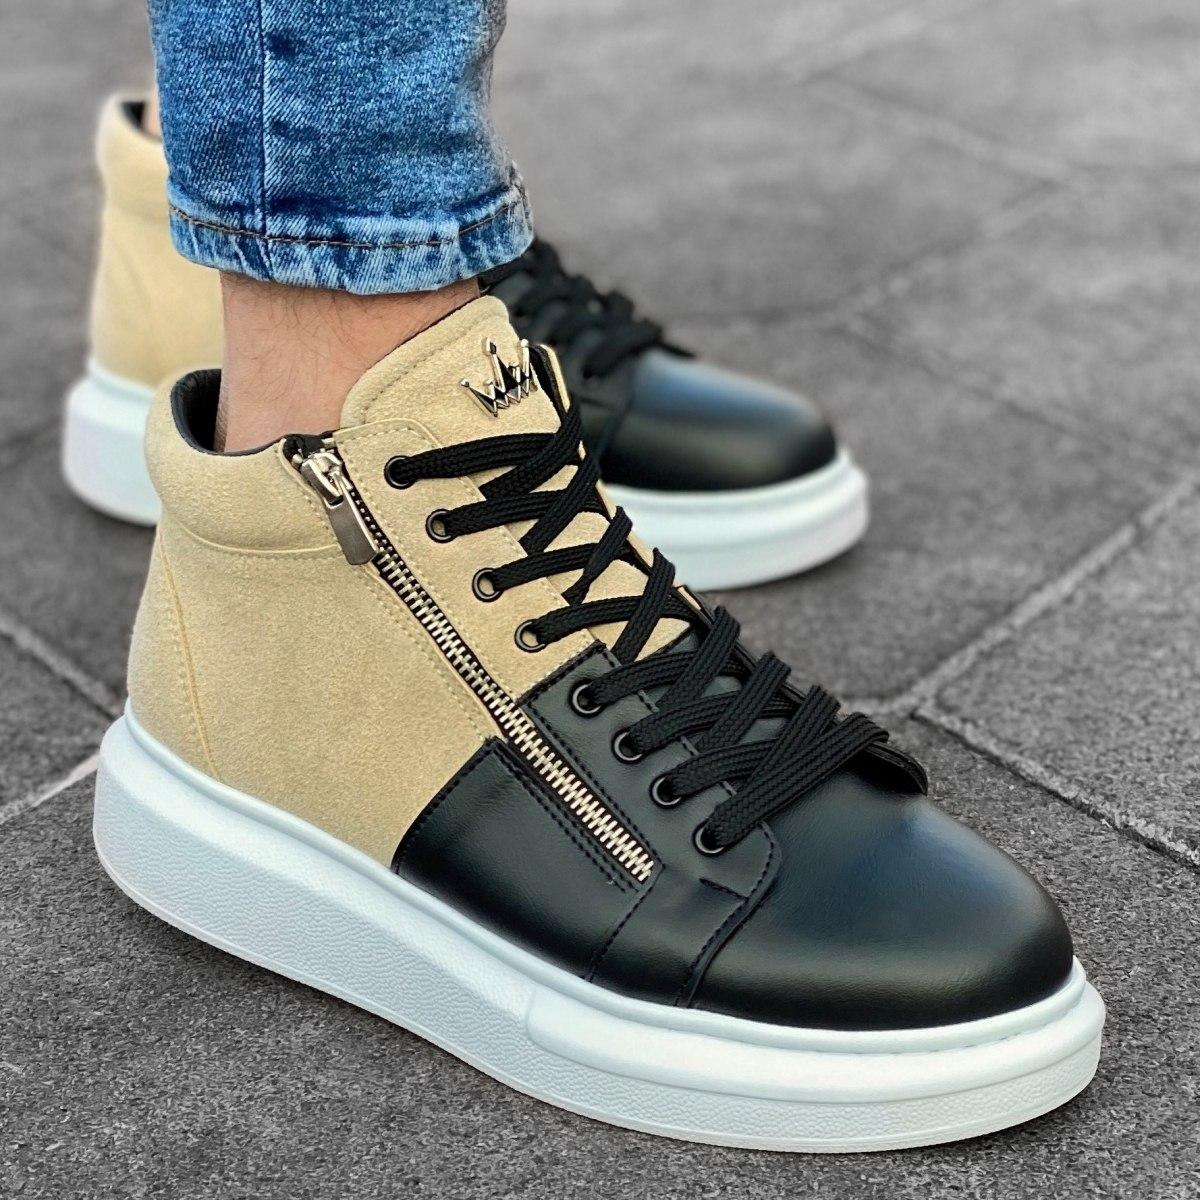 Herren High Top Sneakers Designer Schuhe mit Reißverschluss in creme-schwarz